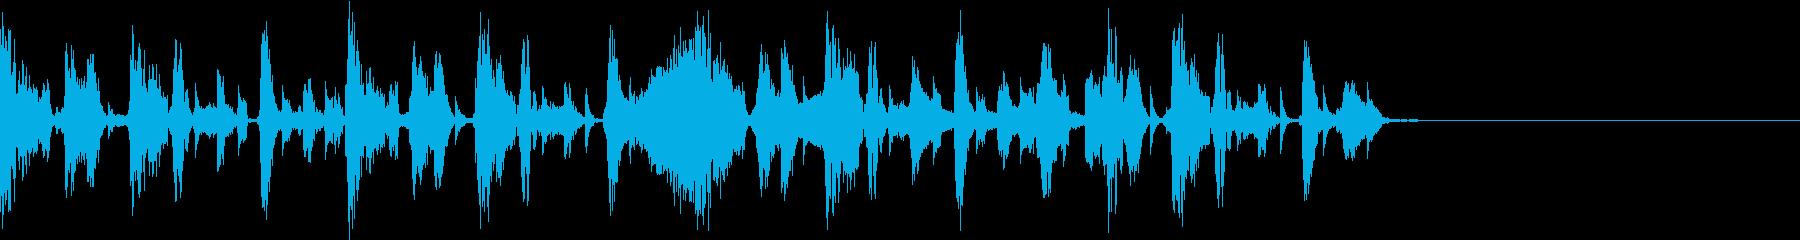 testの再生済みの波形